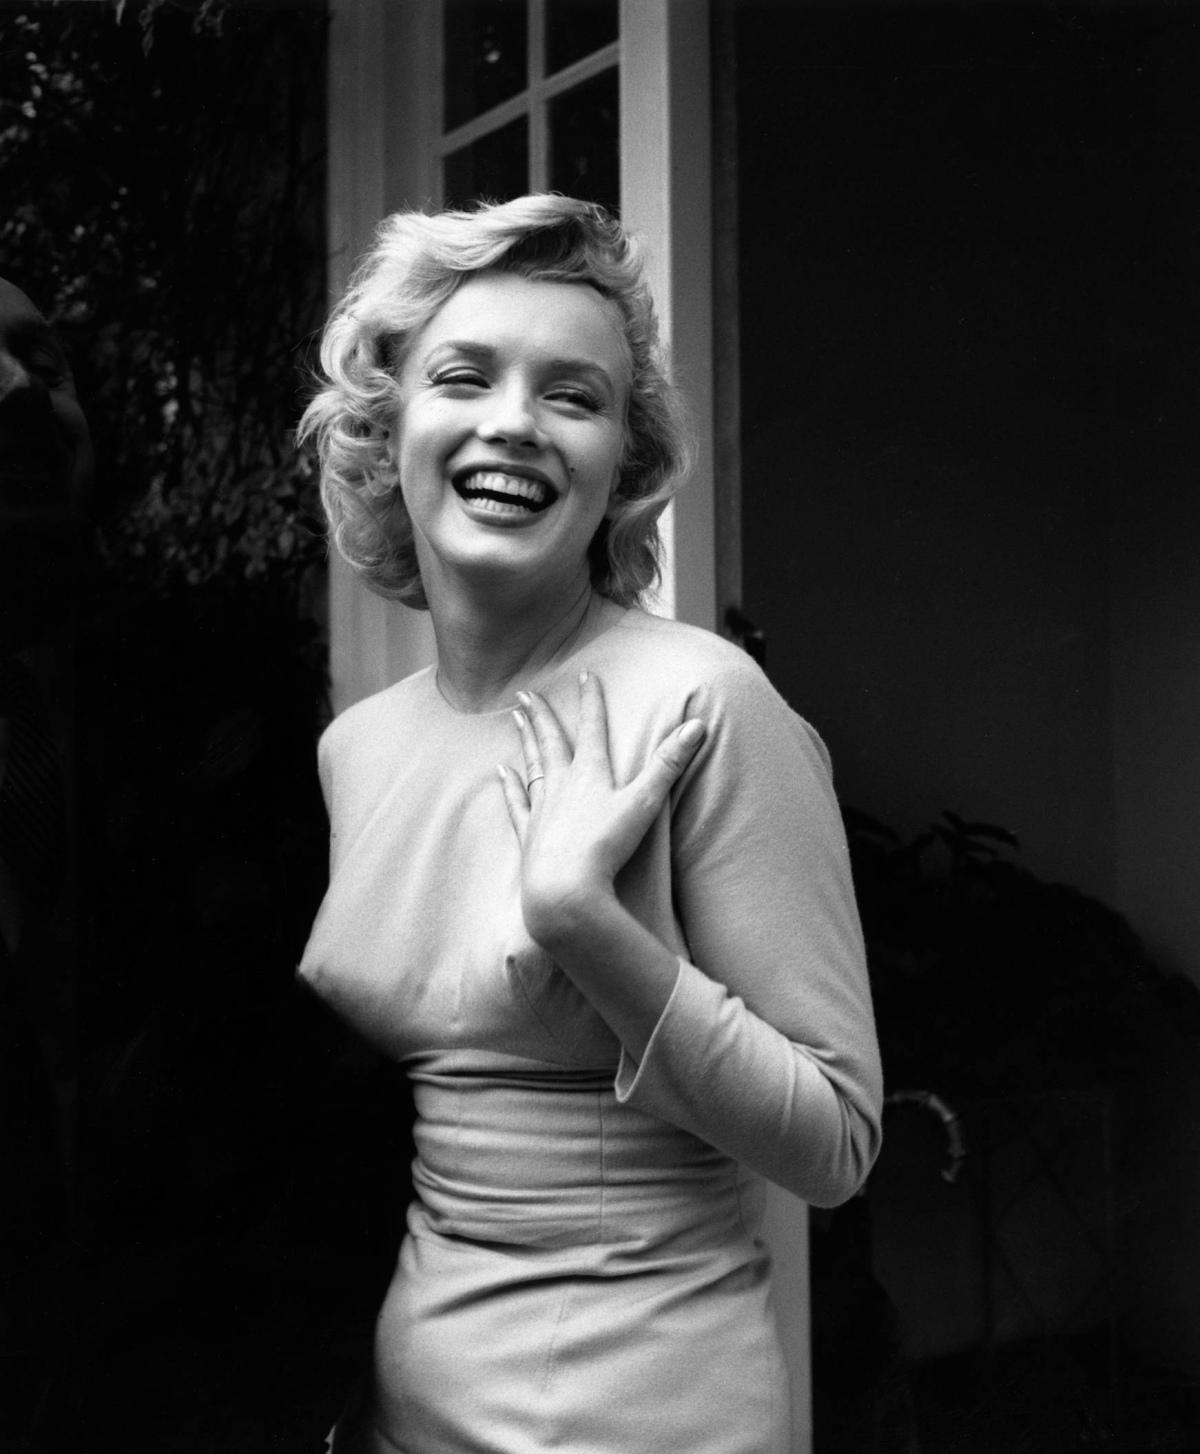 Annex - Monroe, Marilyn_139